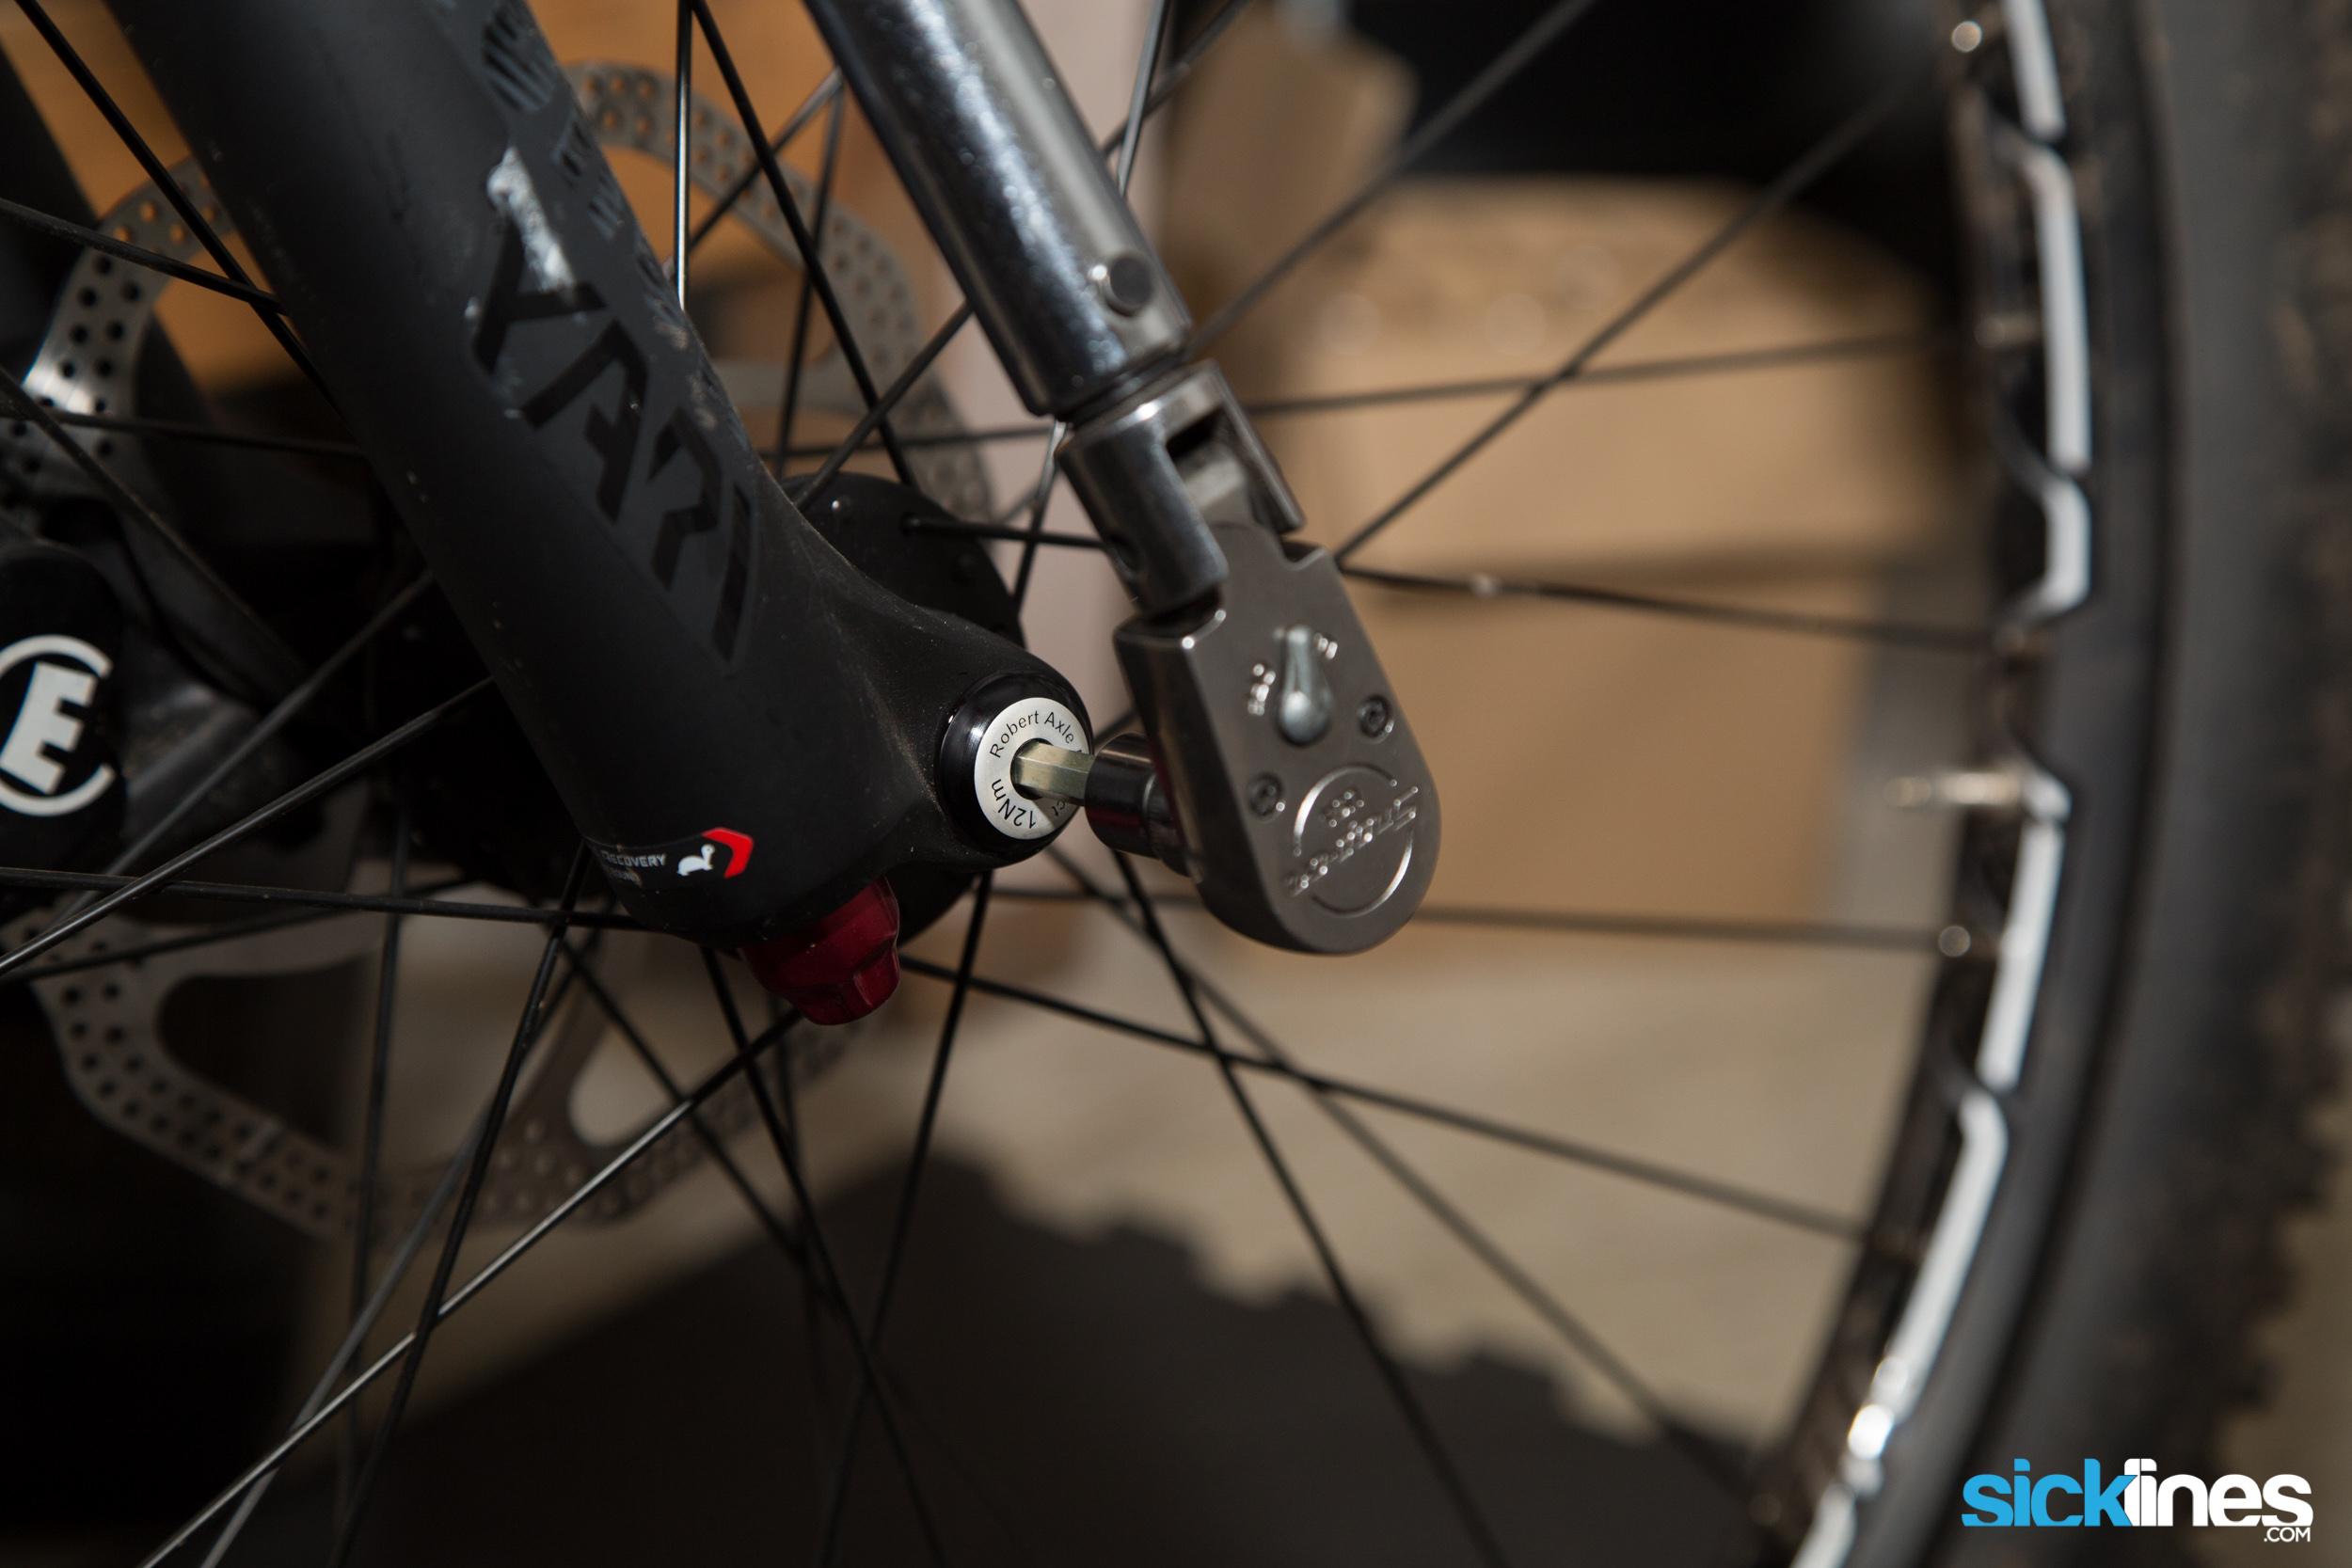 Bike Thru Axles Explained in Detail, Video: Bike Thru Axles Explained in Detail